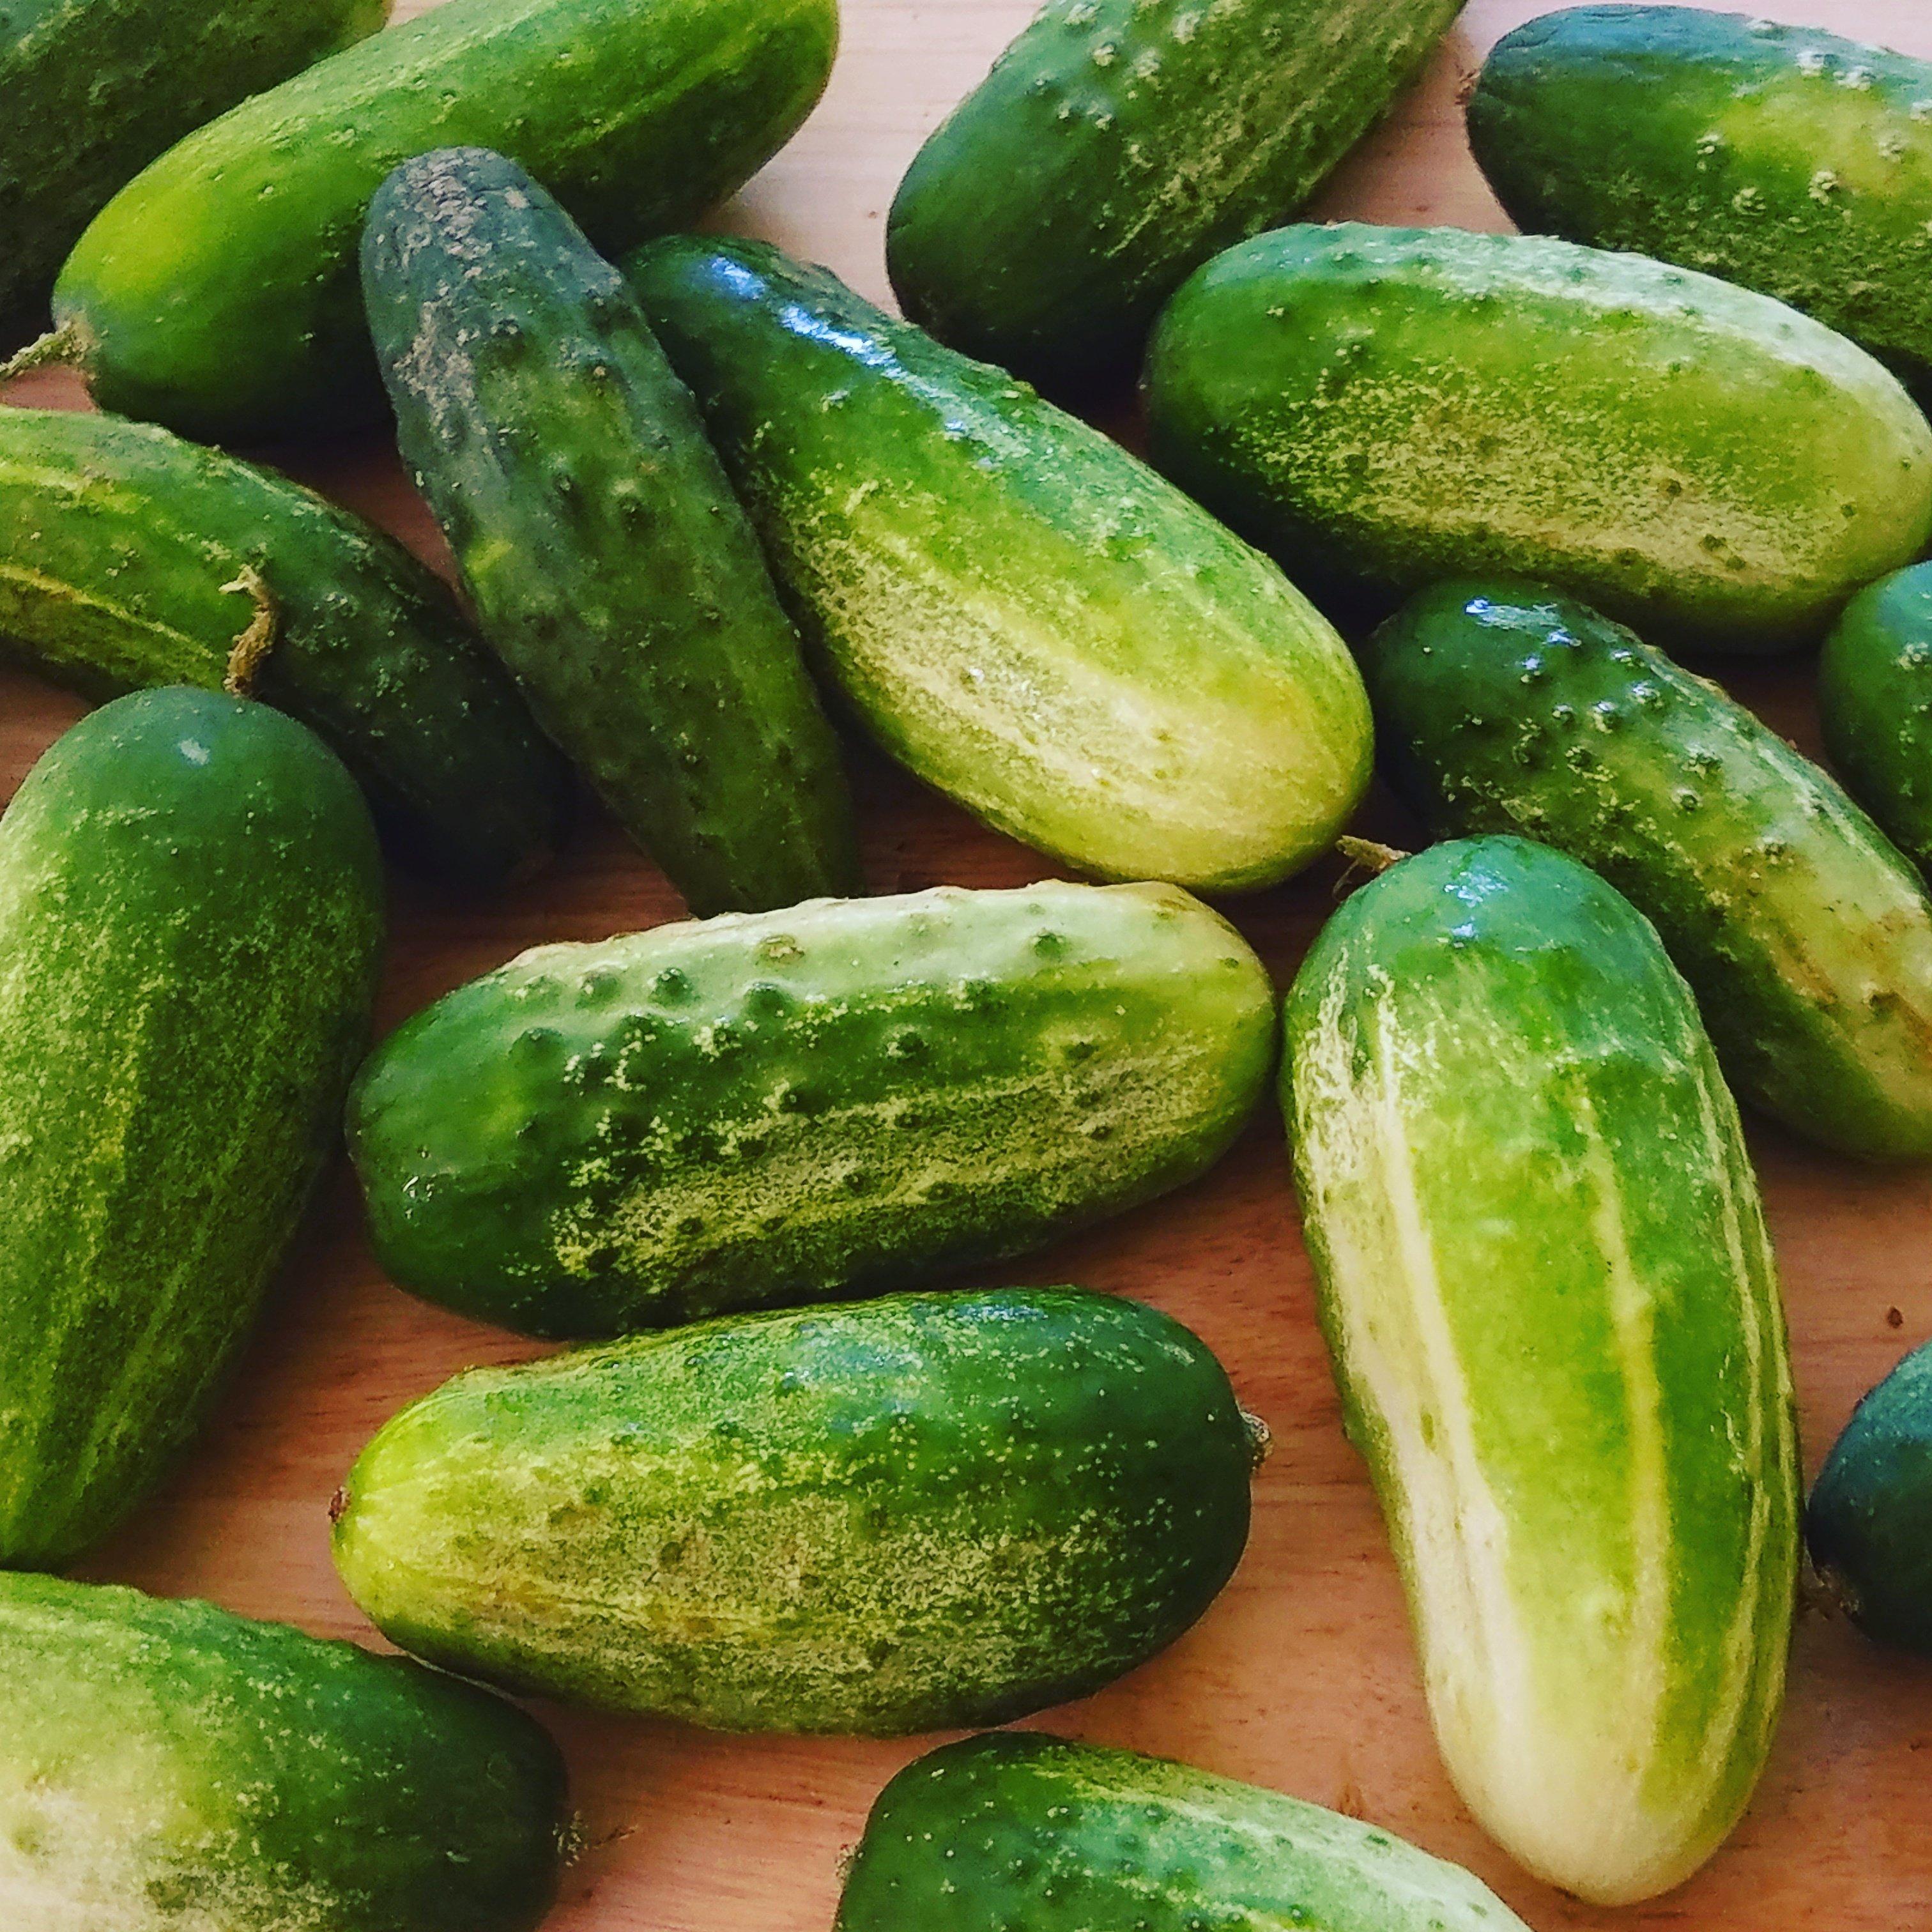 cucumbers from my husbands garden